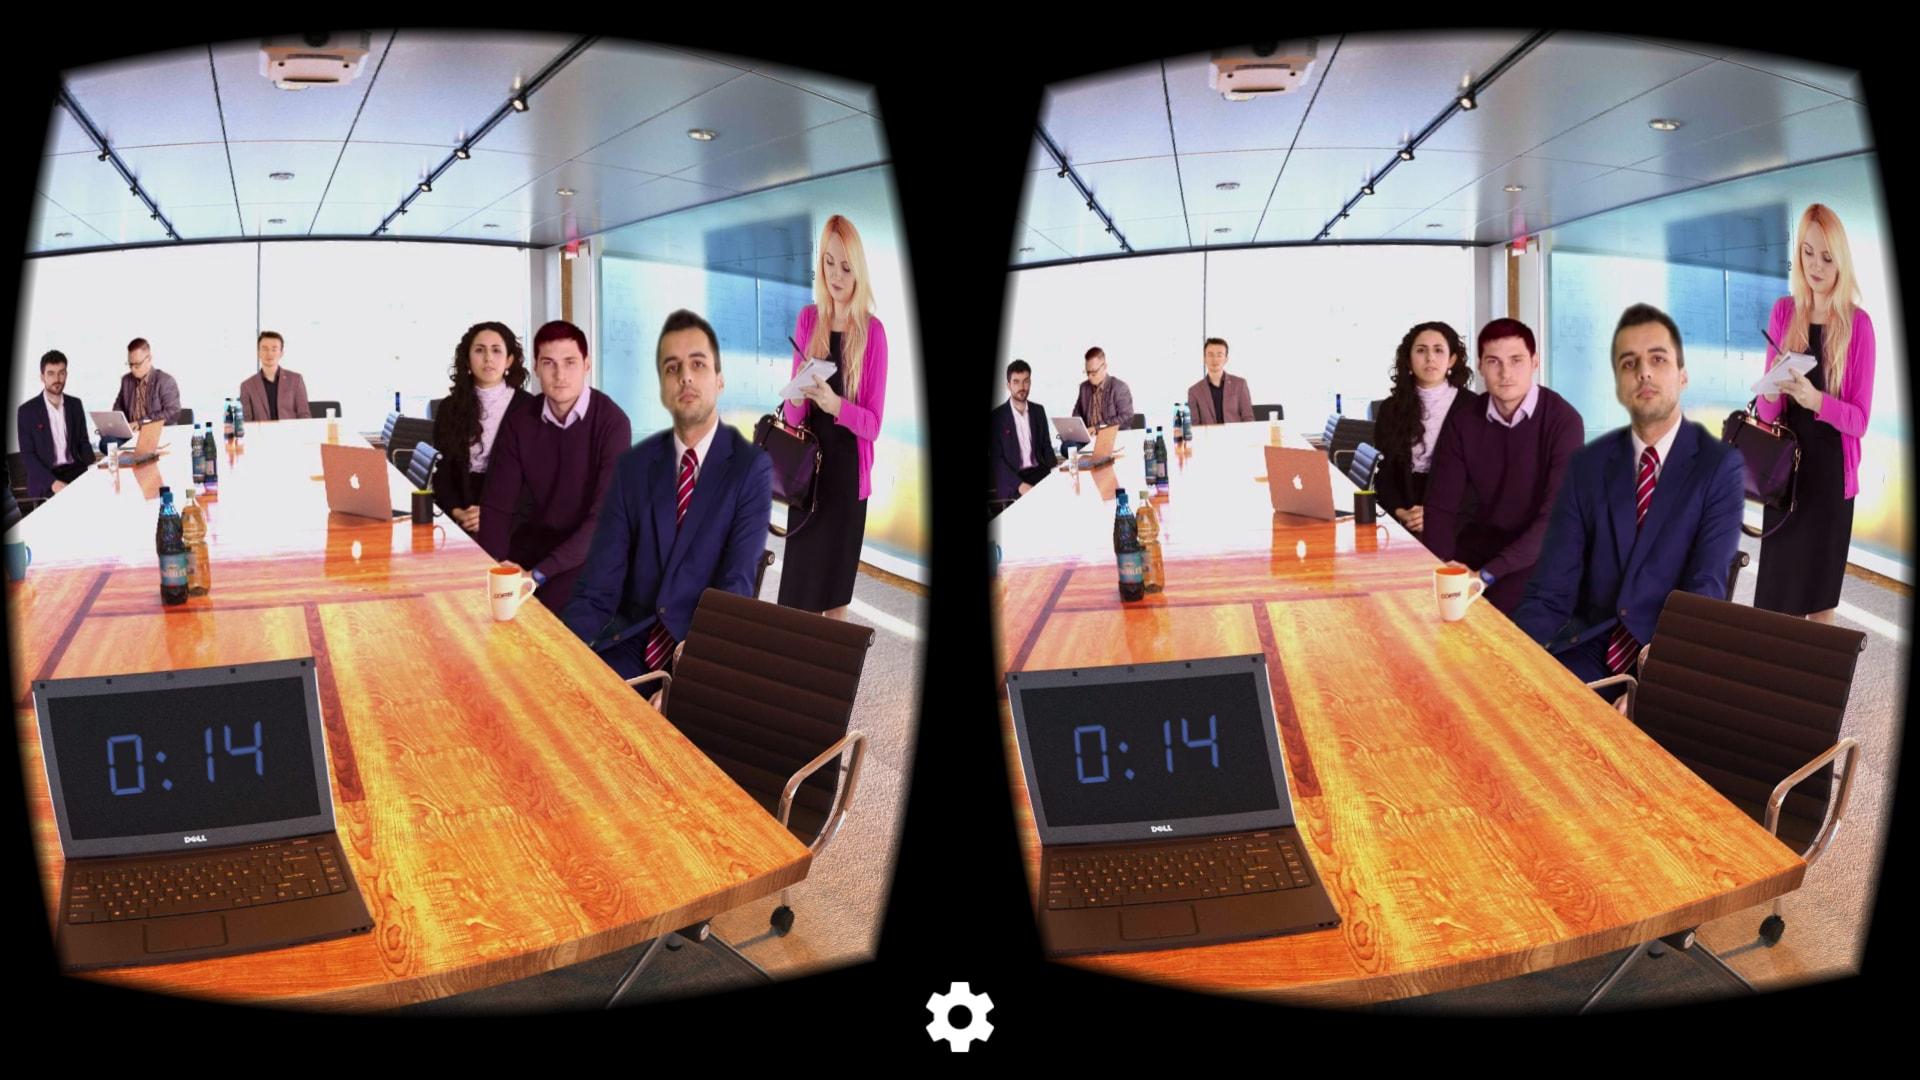 virtualspeech_meeting_room3png (1)